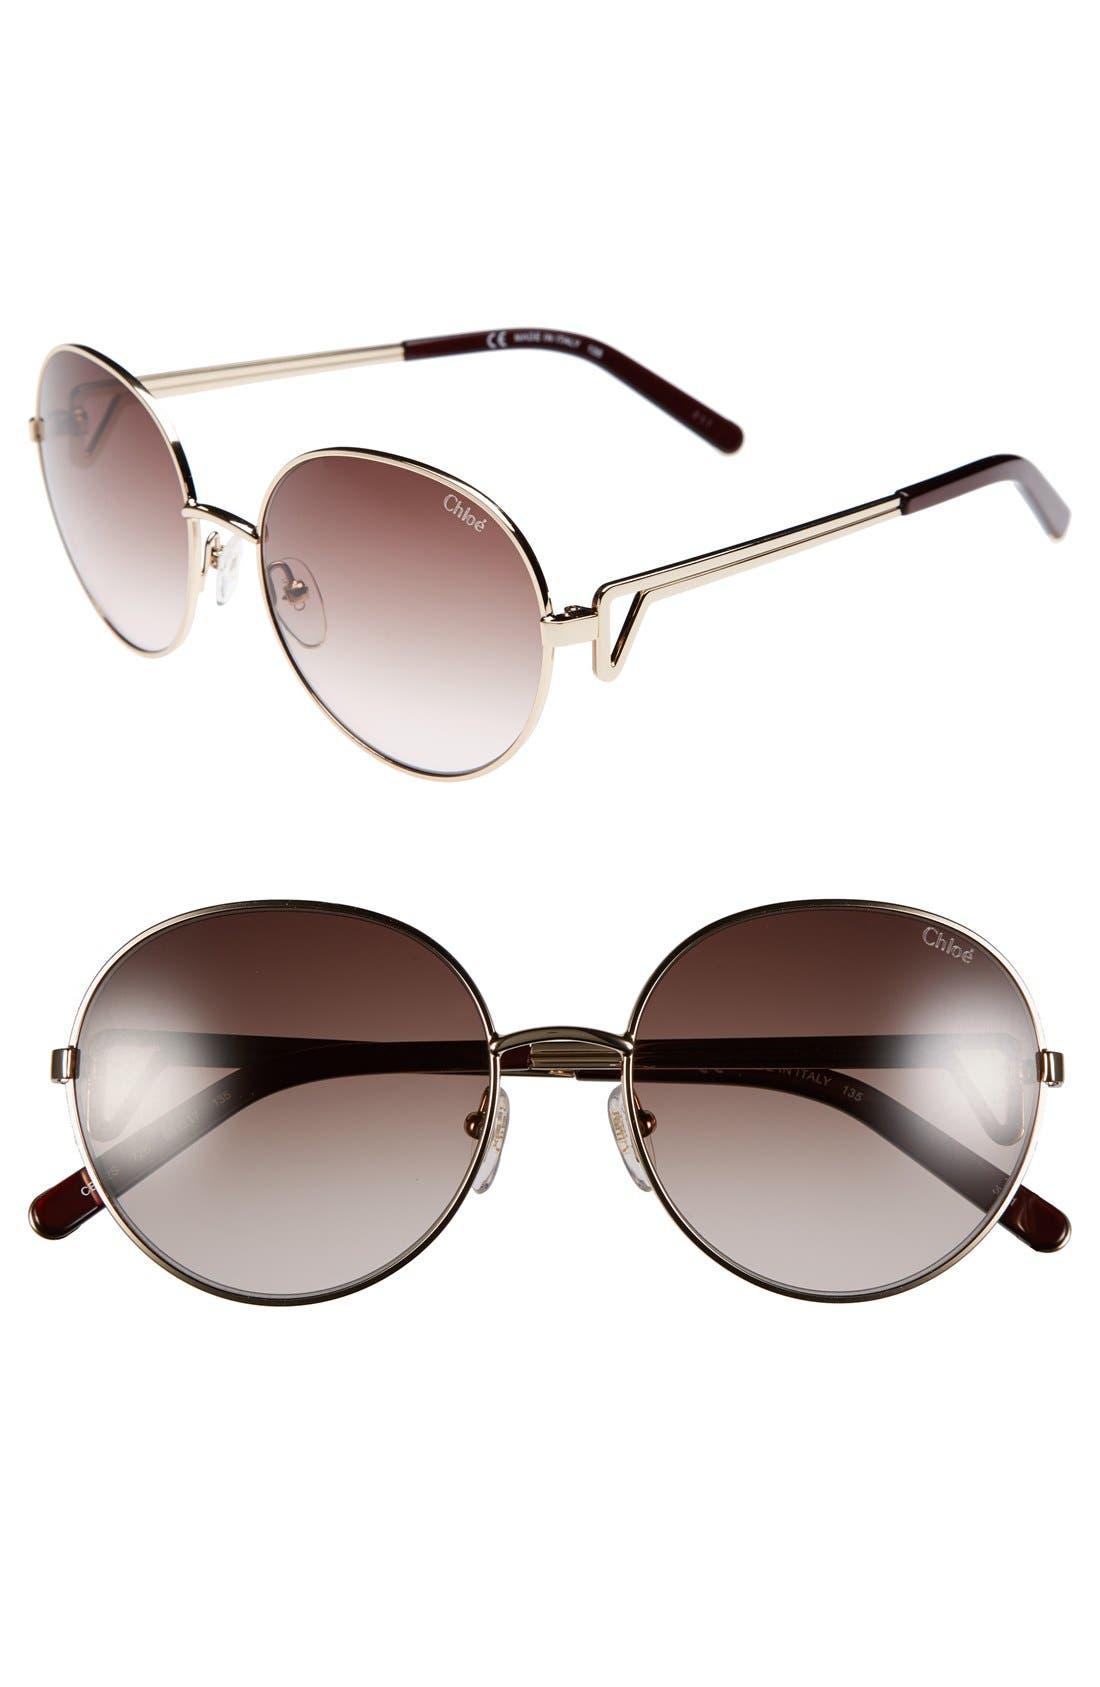 Alternate Image 1 Selected - Chloé 55mm Oval Sunglasses